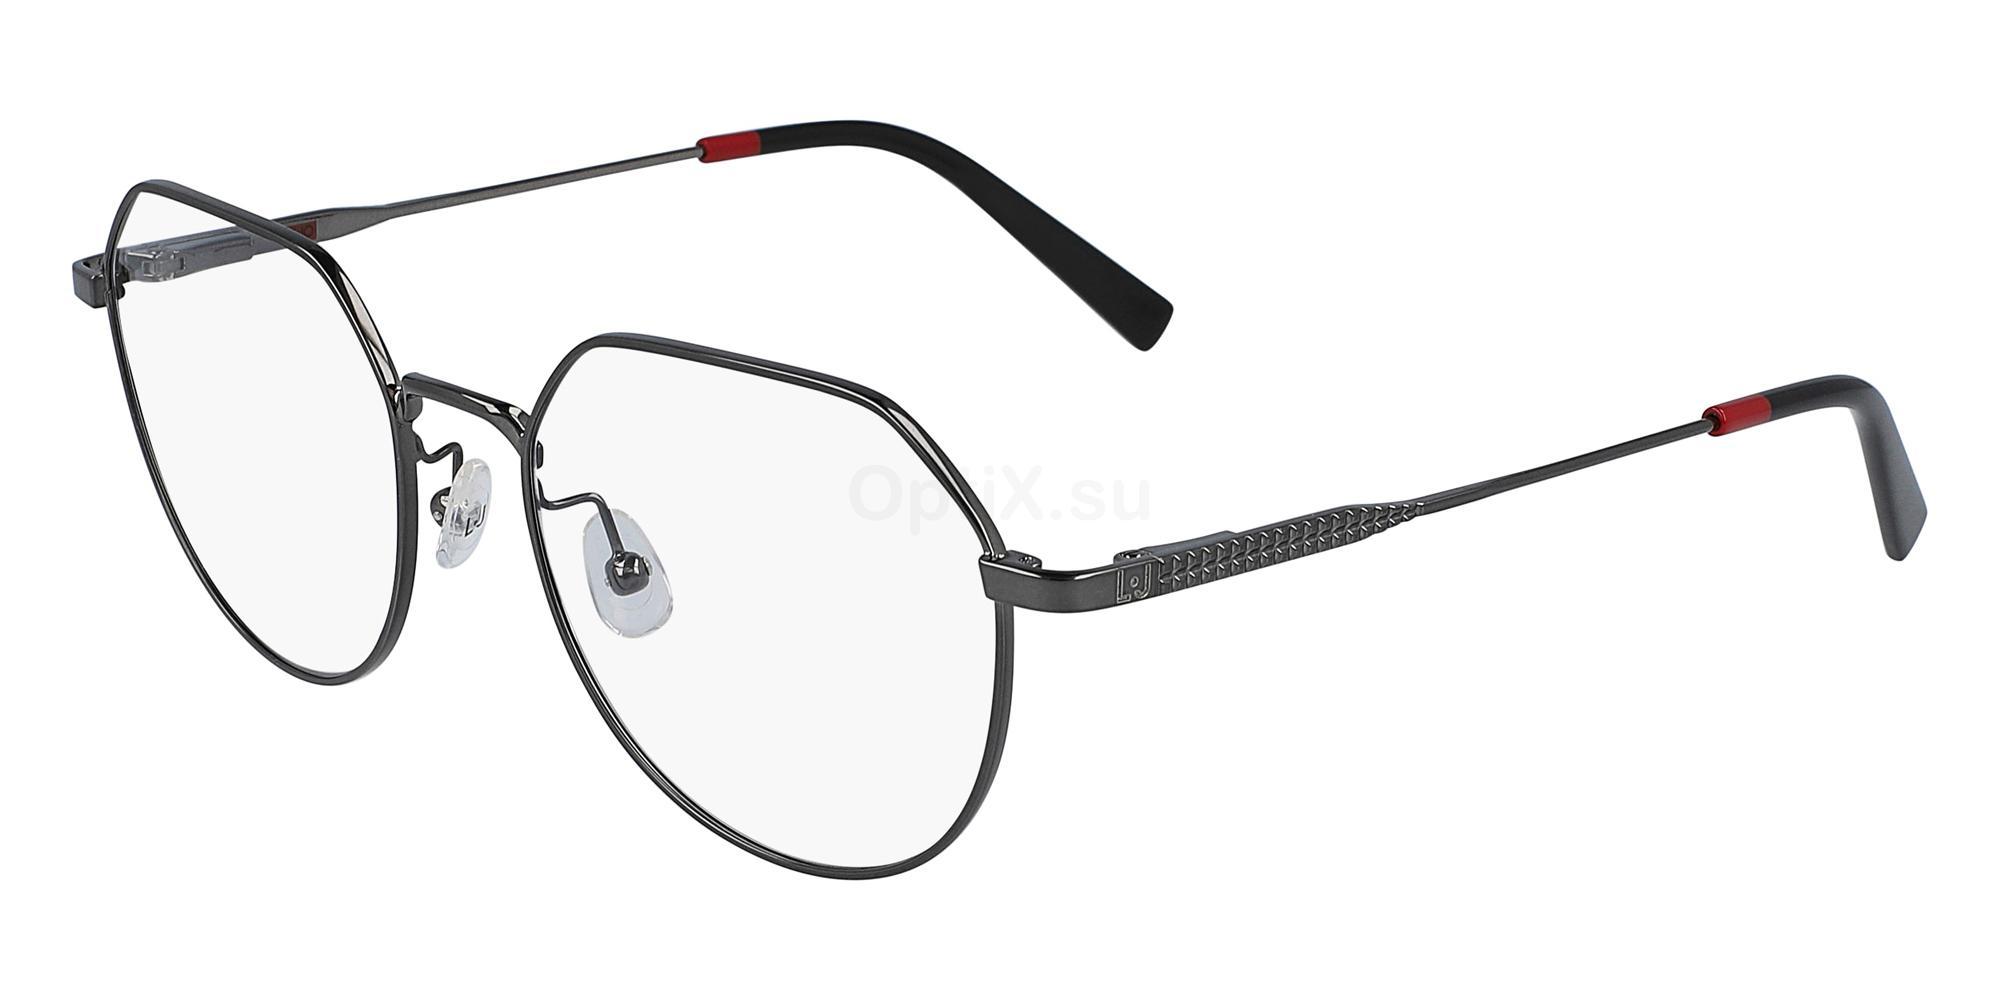 015 LJ2146 Glasses, Liu Jo